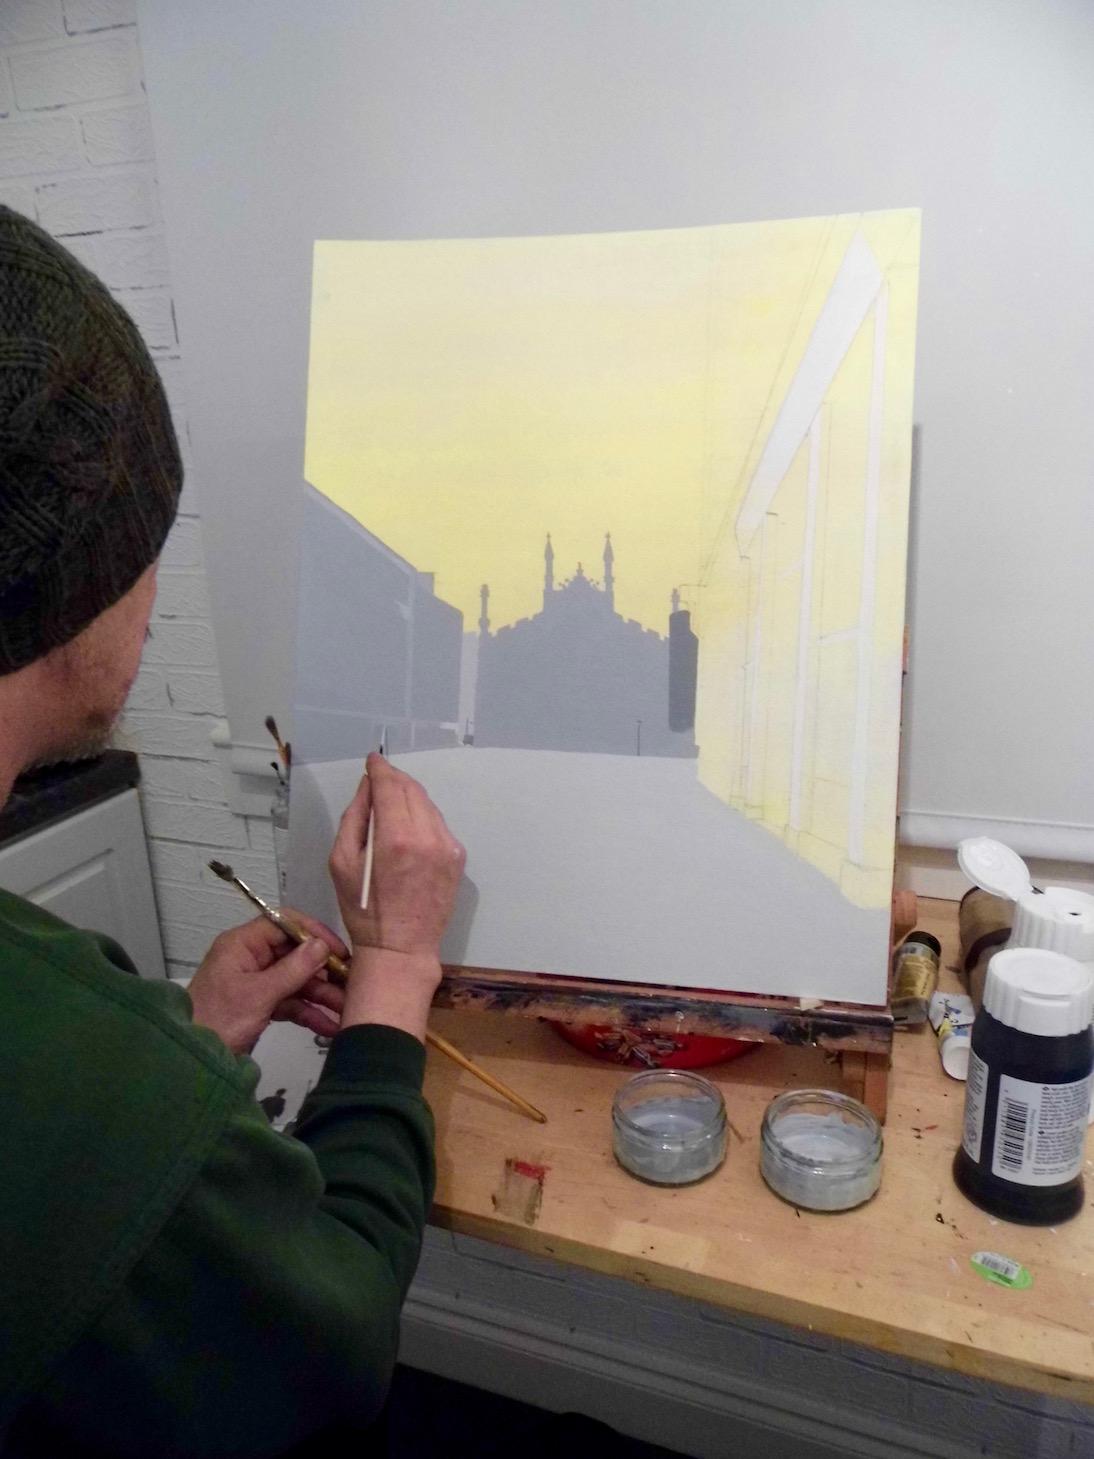 Stephen Scott: Artist of the month